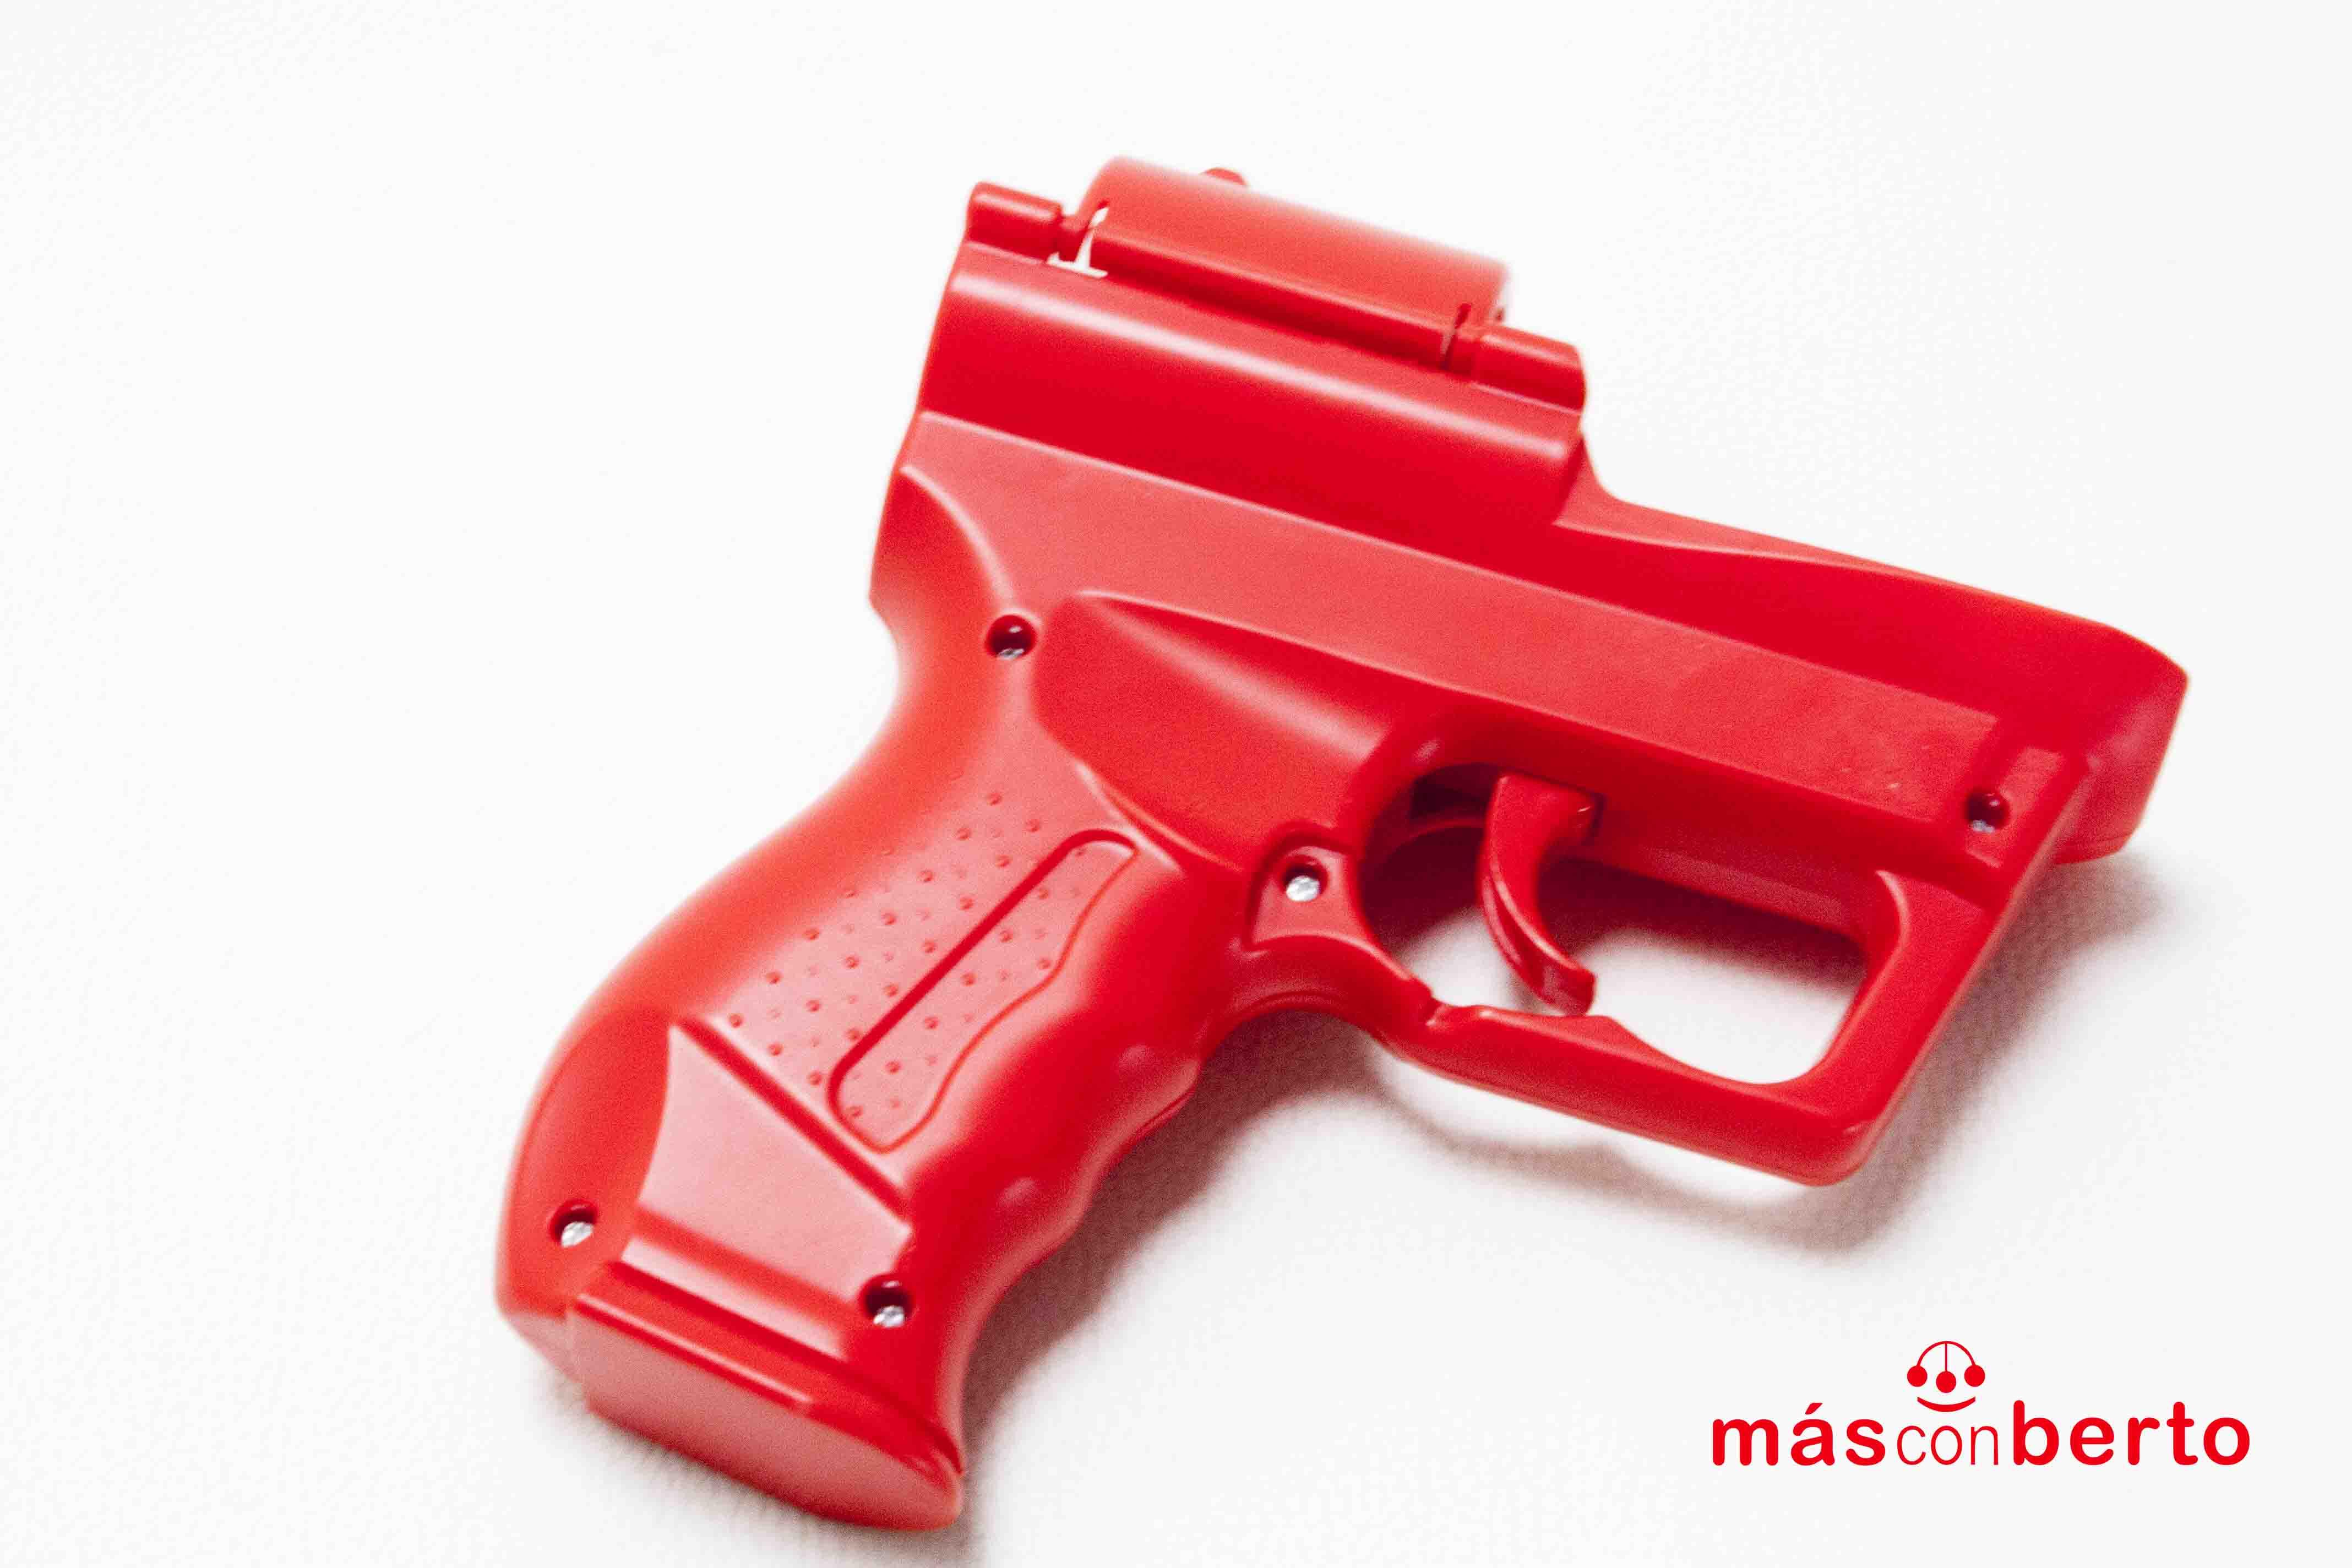 Pistola mando wii Rojo